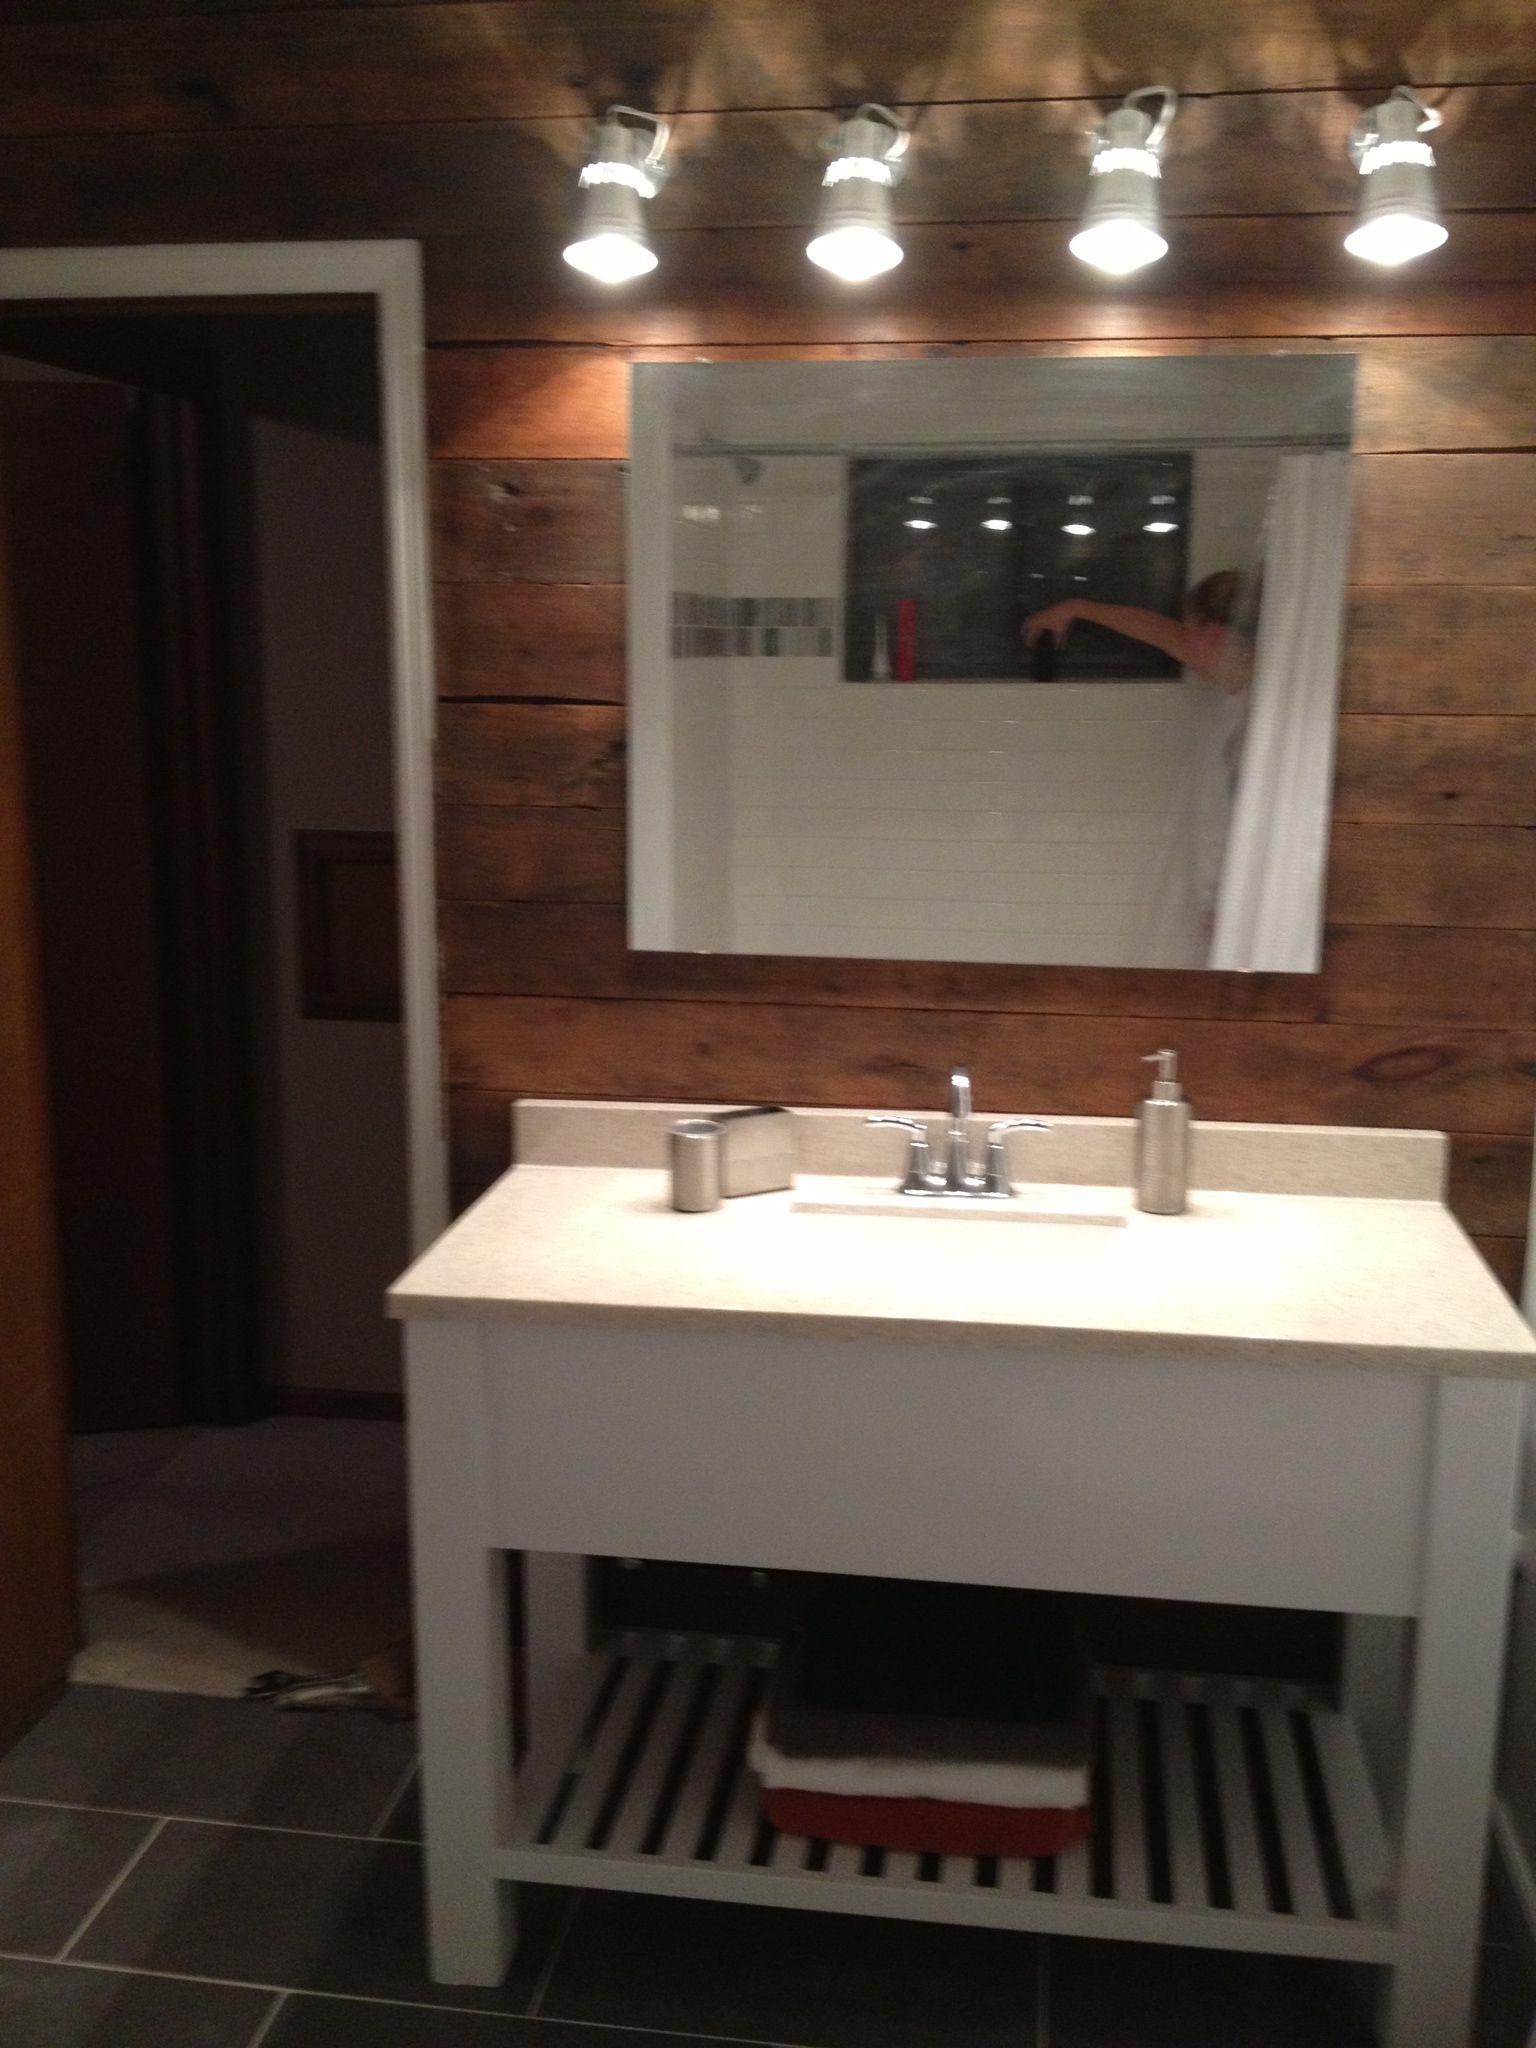 wooden ikea bathroom vanities | Bath vanity. Barn wood wall. Ikea lights. White modern ...